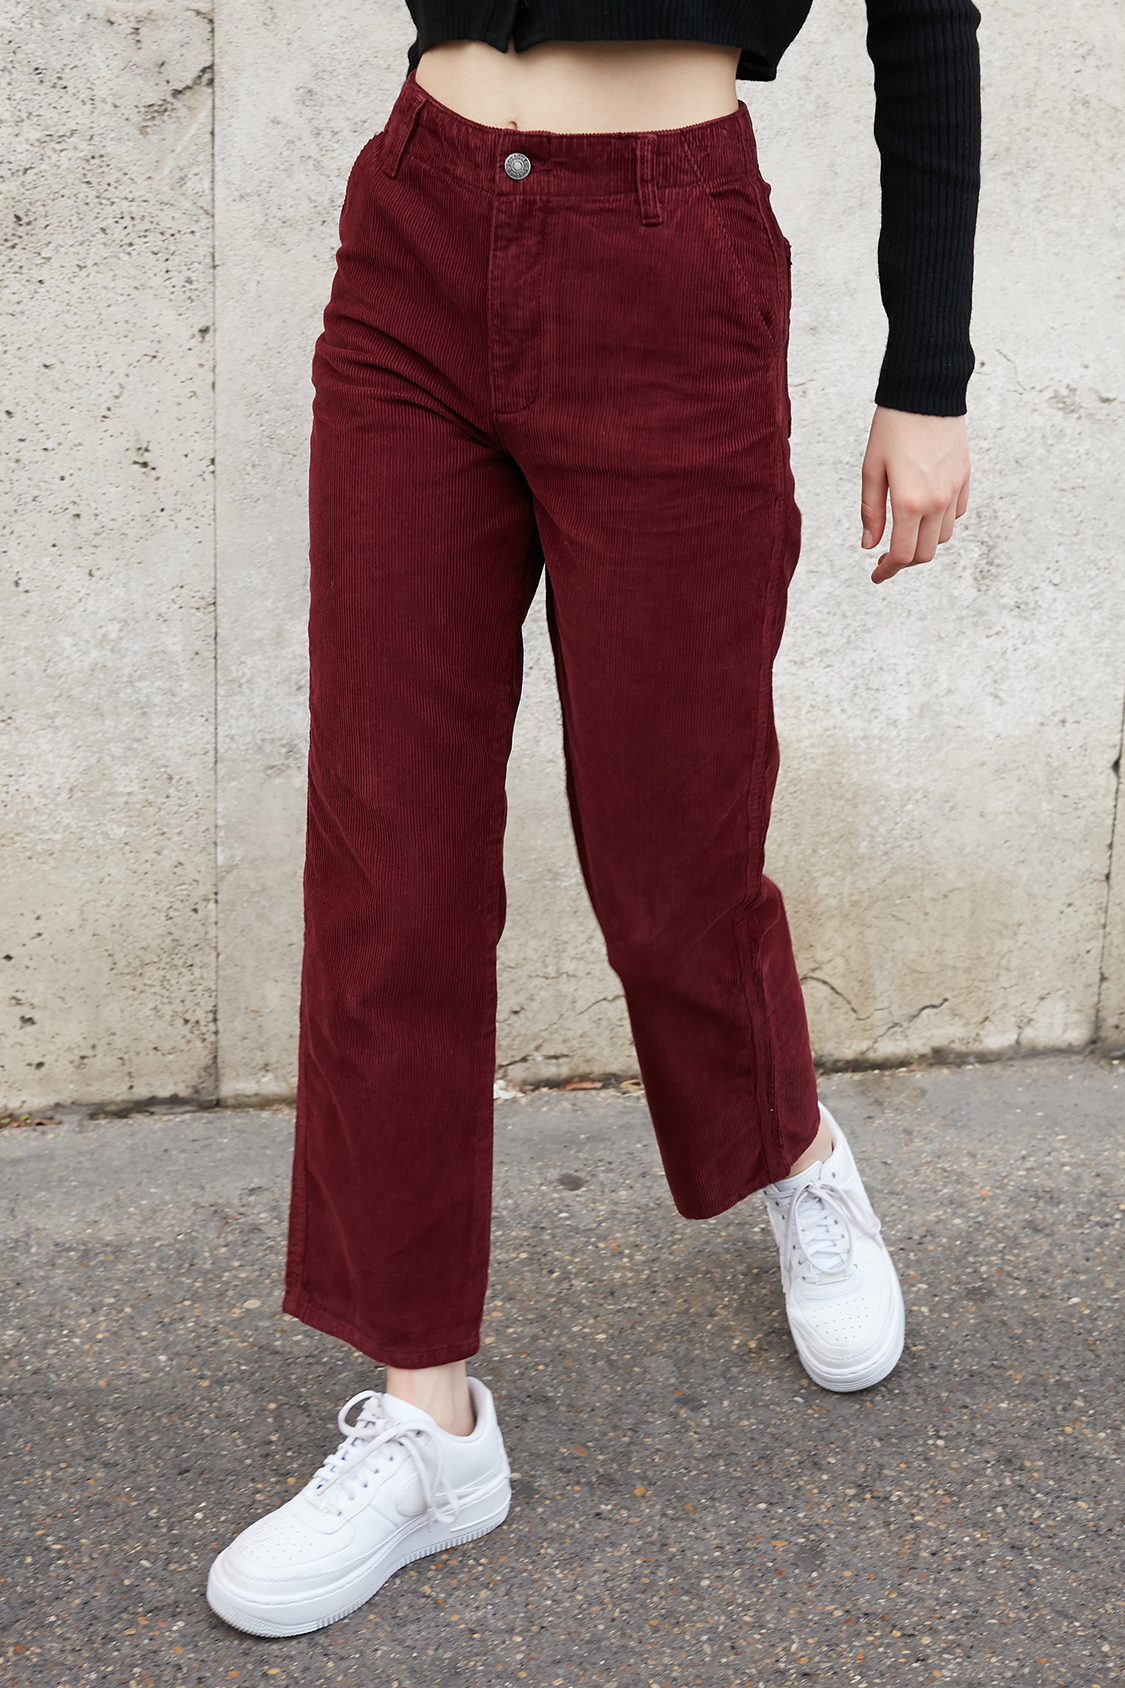 Pantaloni velluto a costine